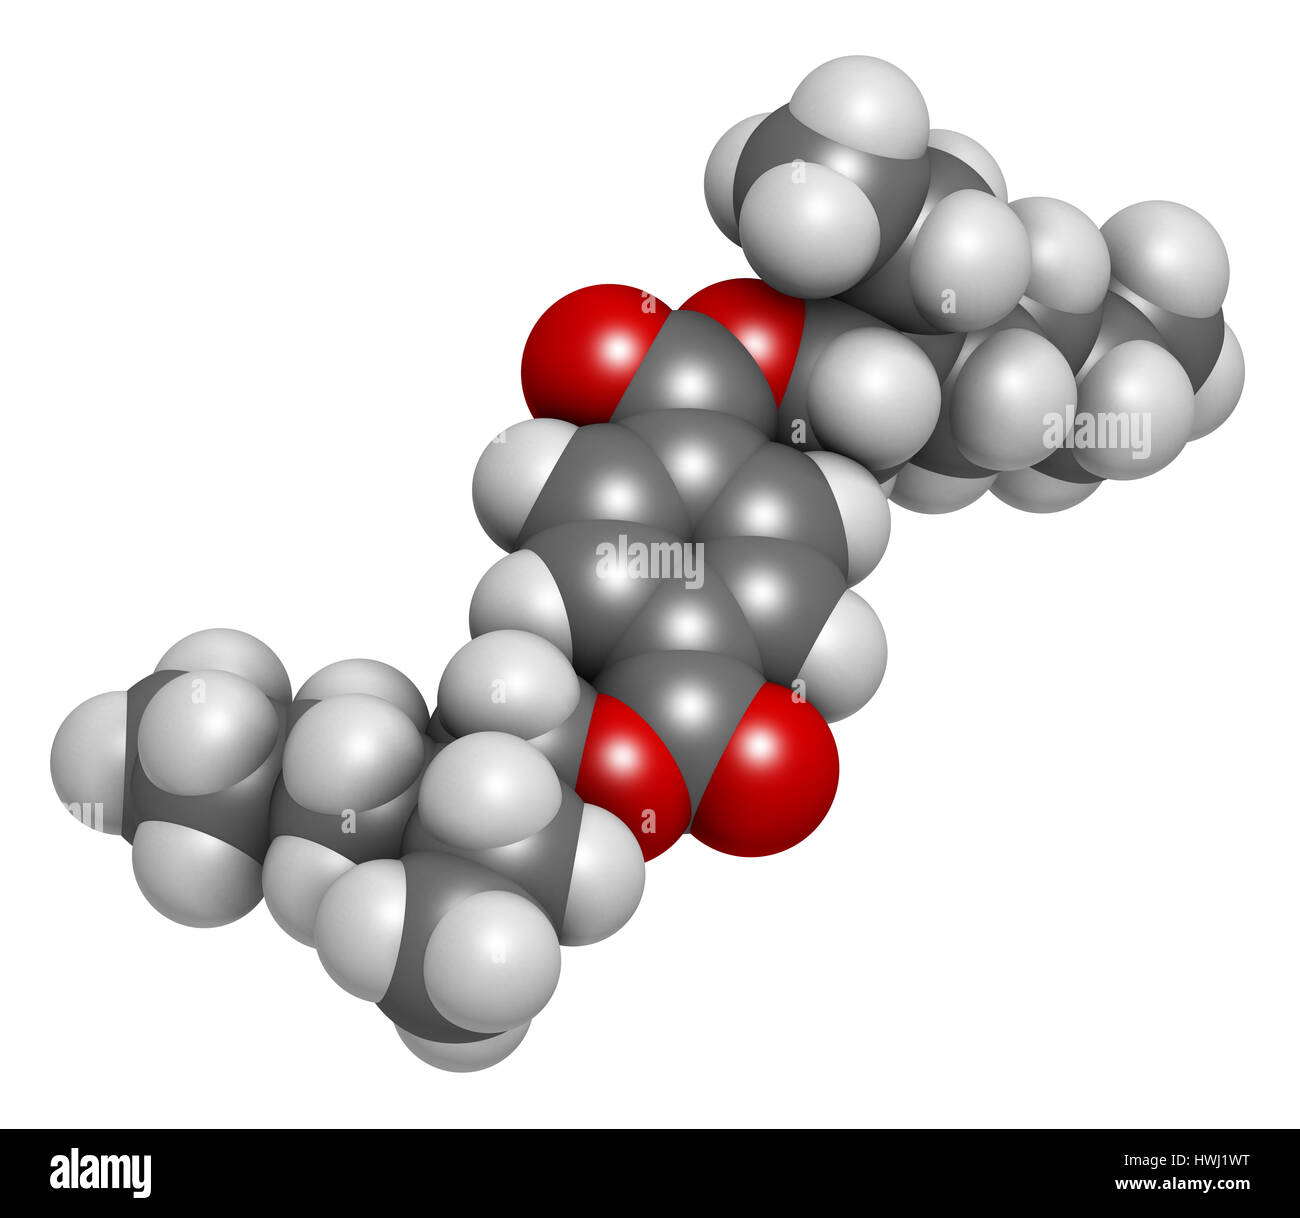 hydrogen phthalate